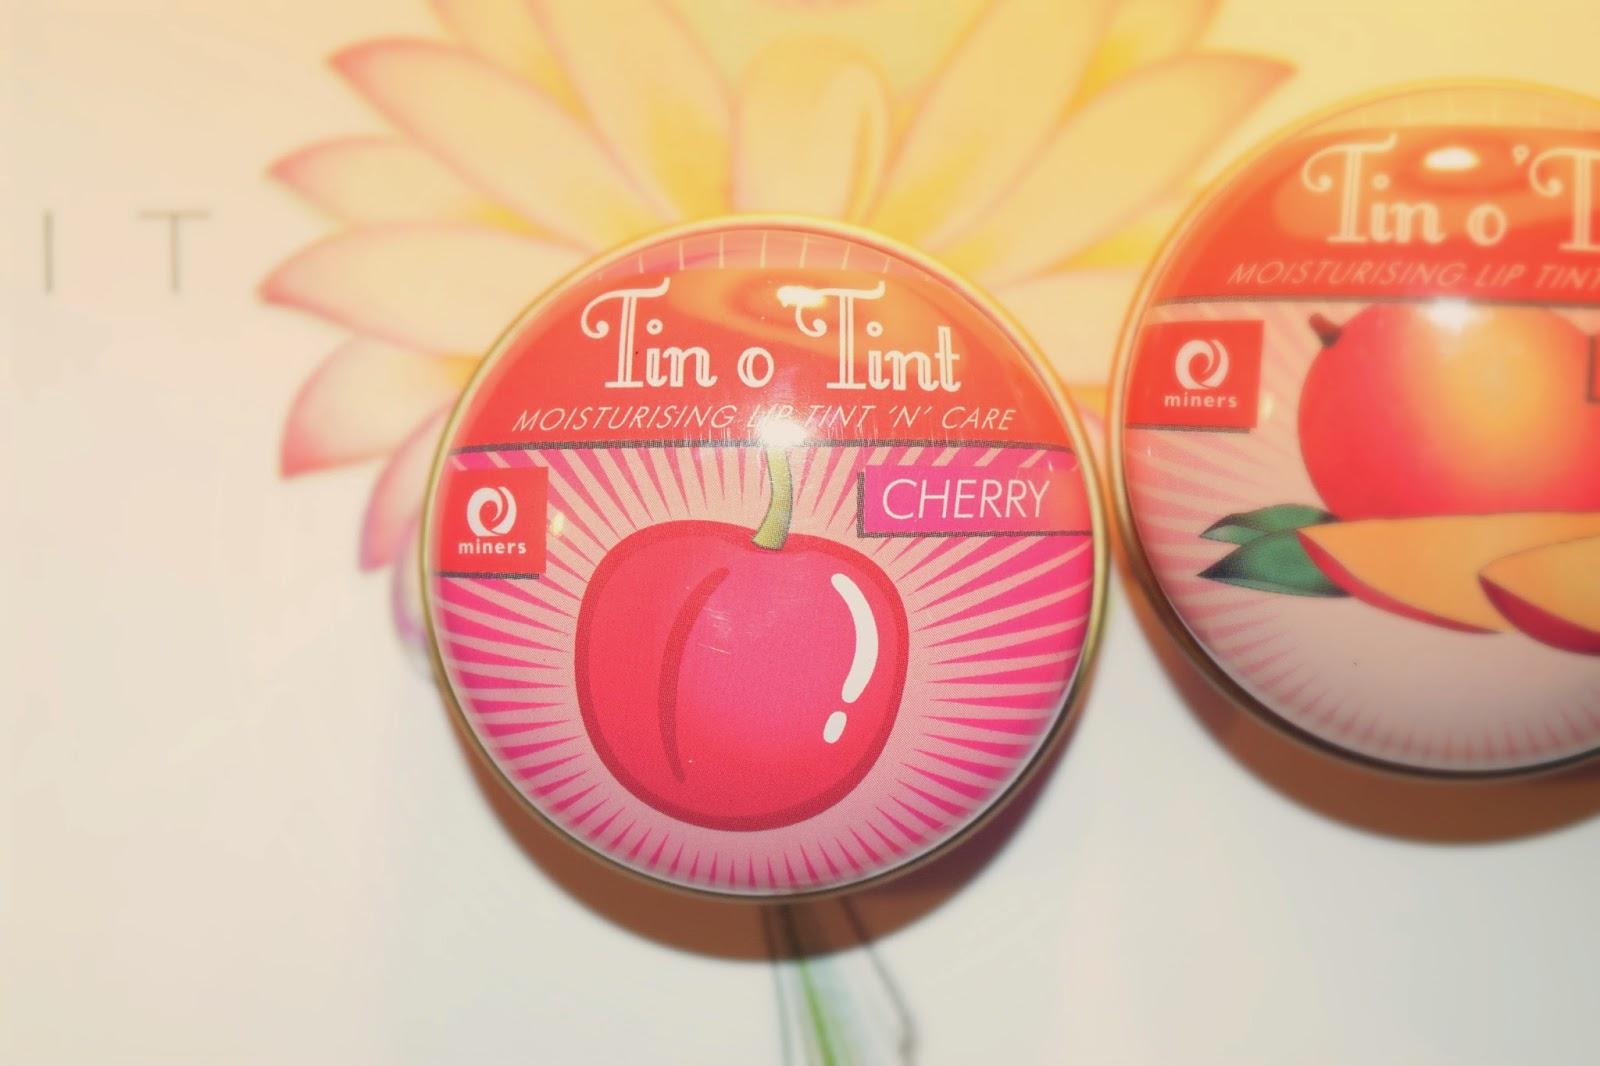 Miners Cosmetics Tin O 'Tint Lip Balms in Mango & Cherry